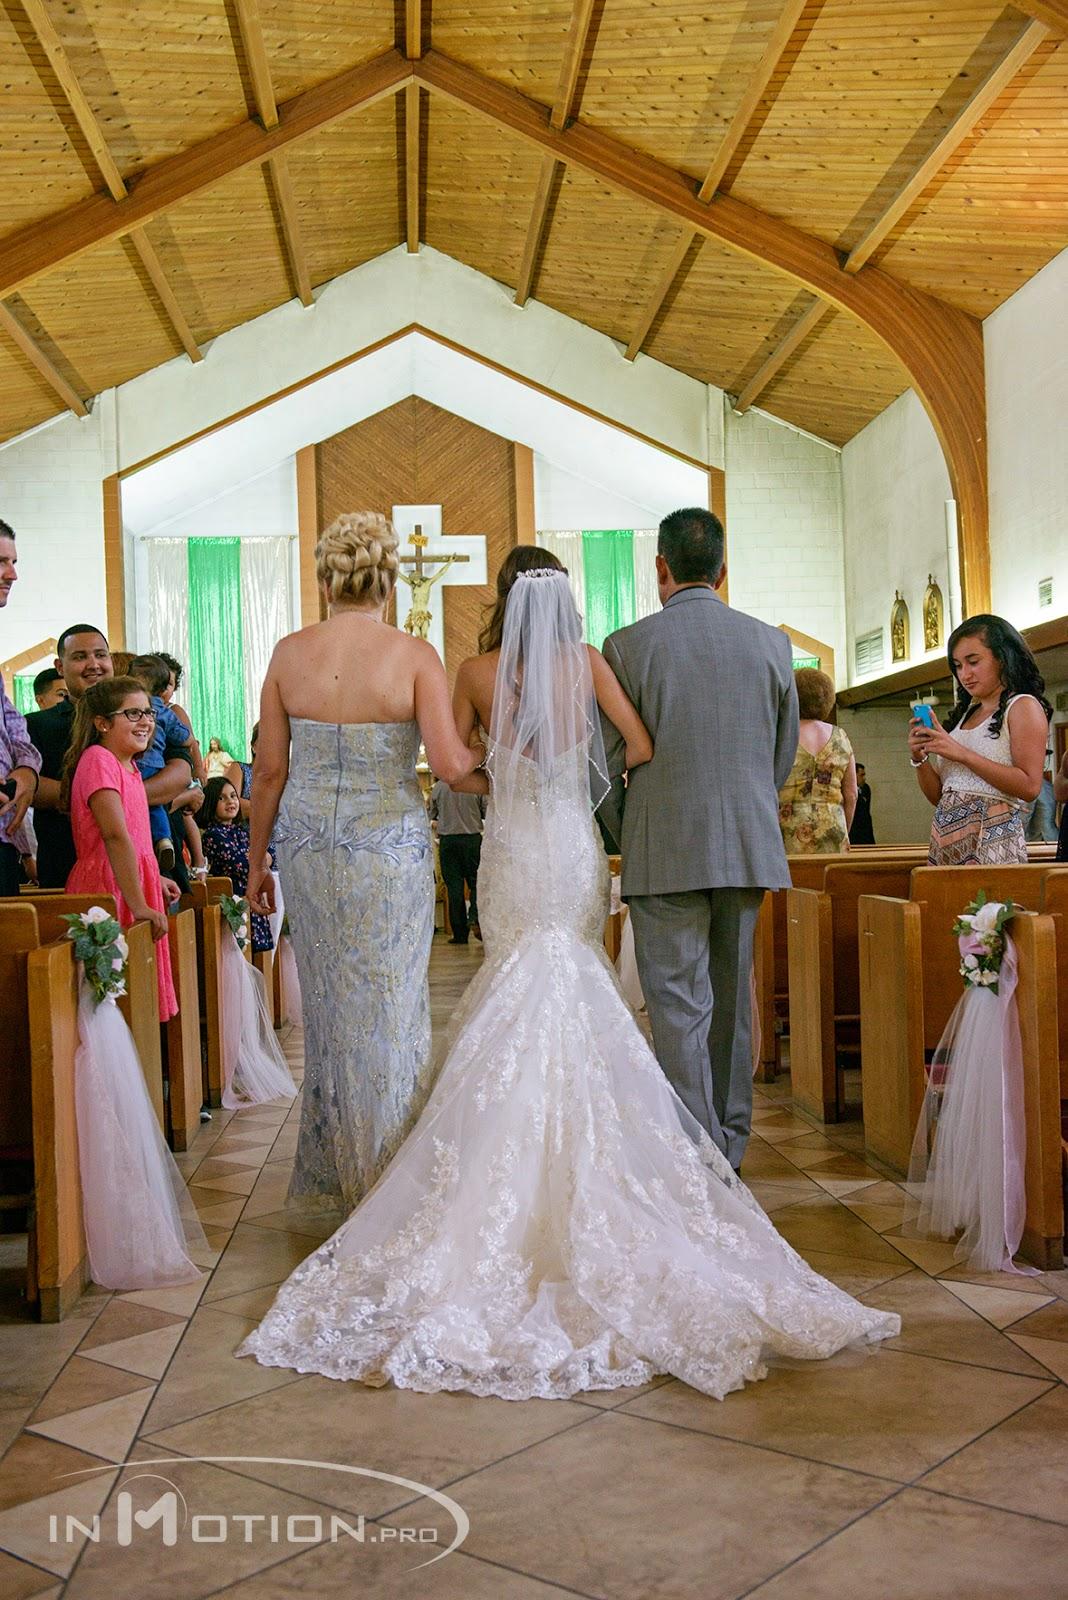 Wedding Photography Bakersfield California Catholic Dress Walking Down The